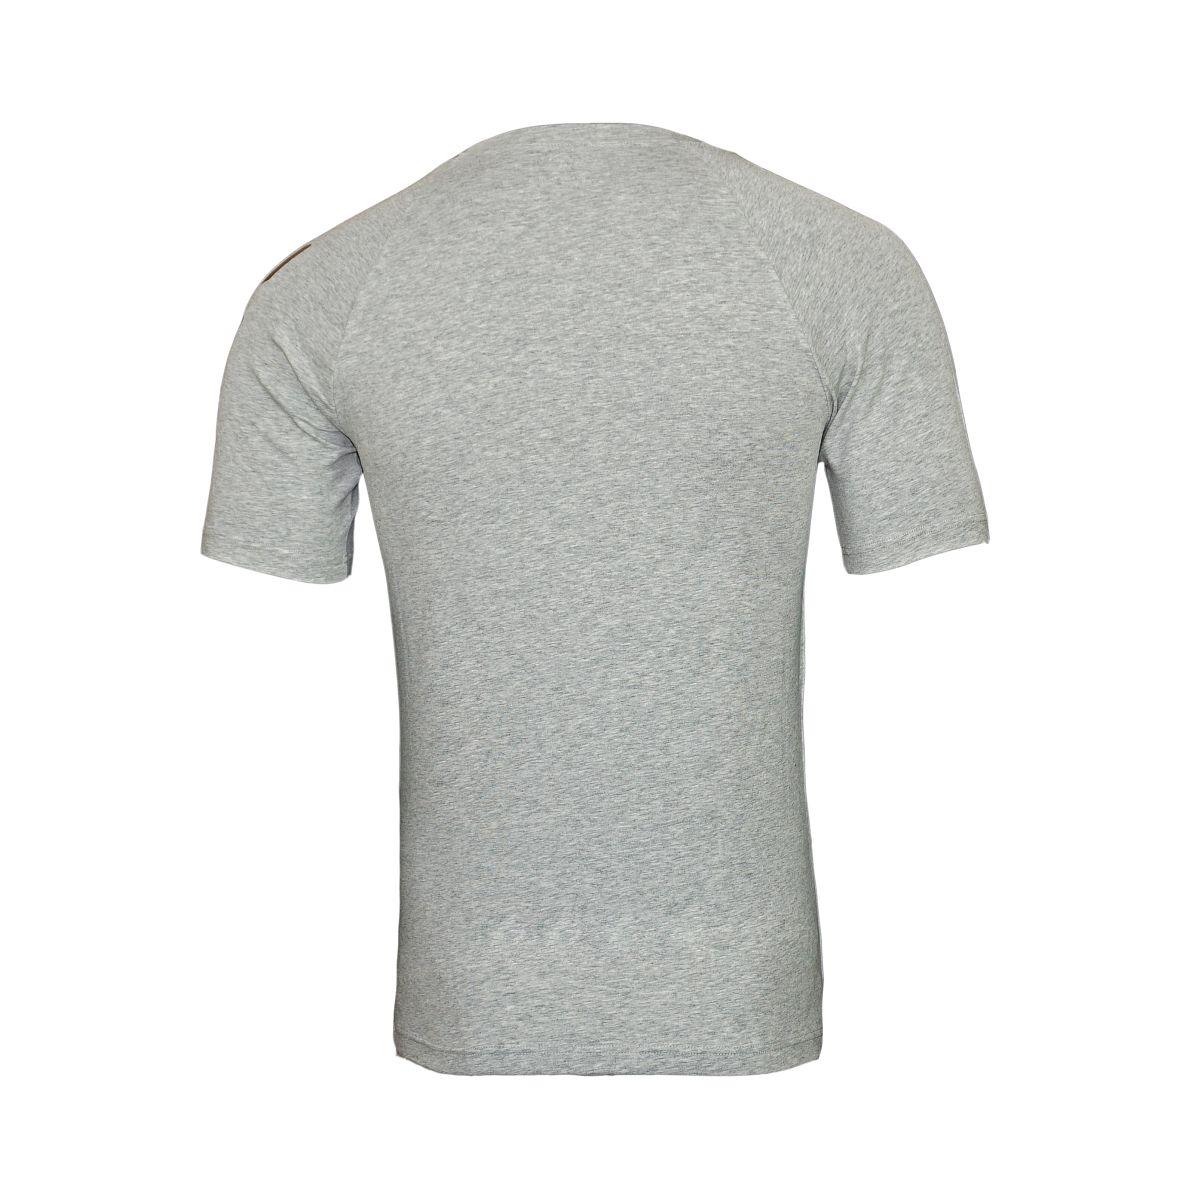 Emporio Armani T-Shirt V-Ausschnitt 111760 8P725 00048 GRIGIO MELANGE W18-EATS1